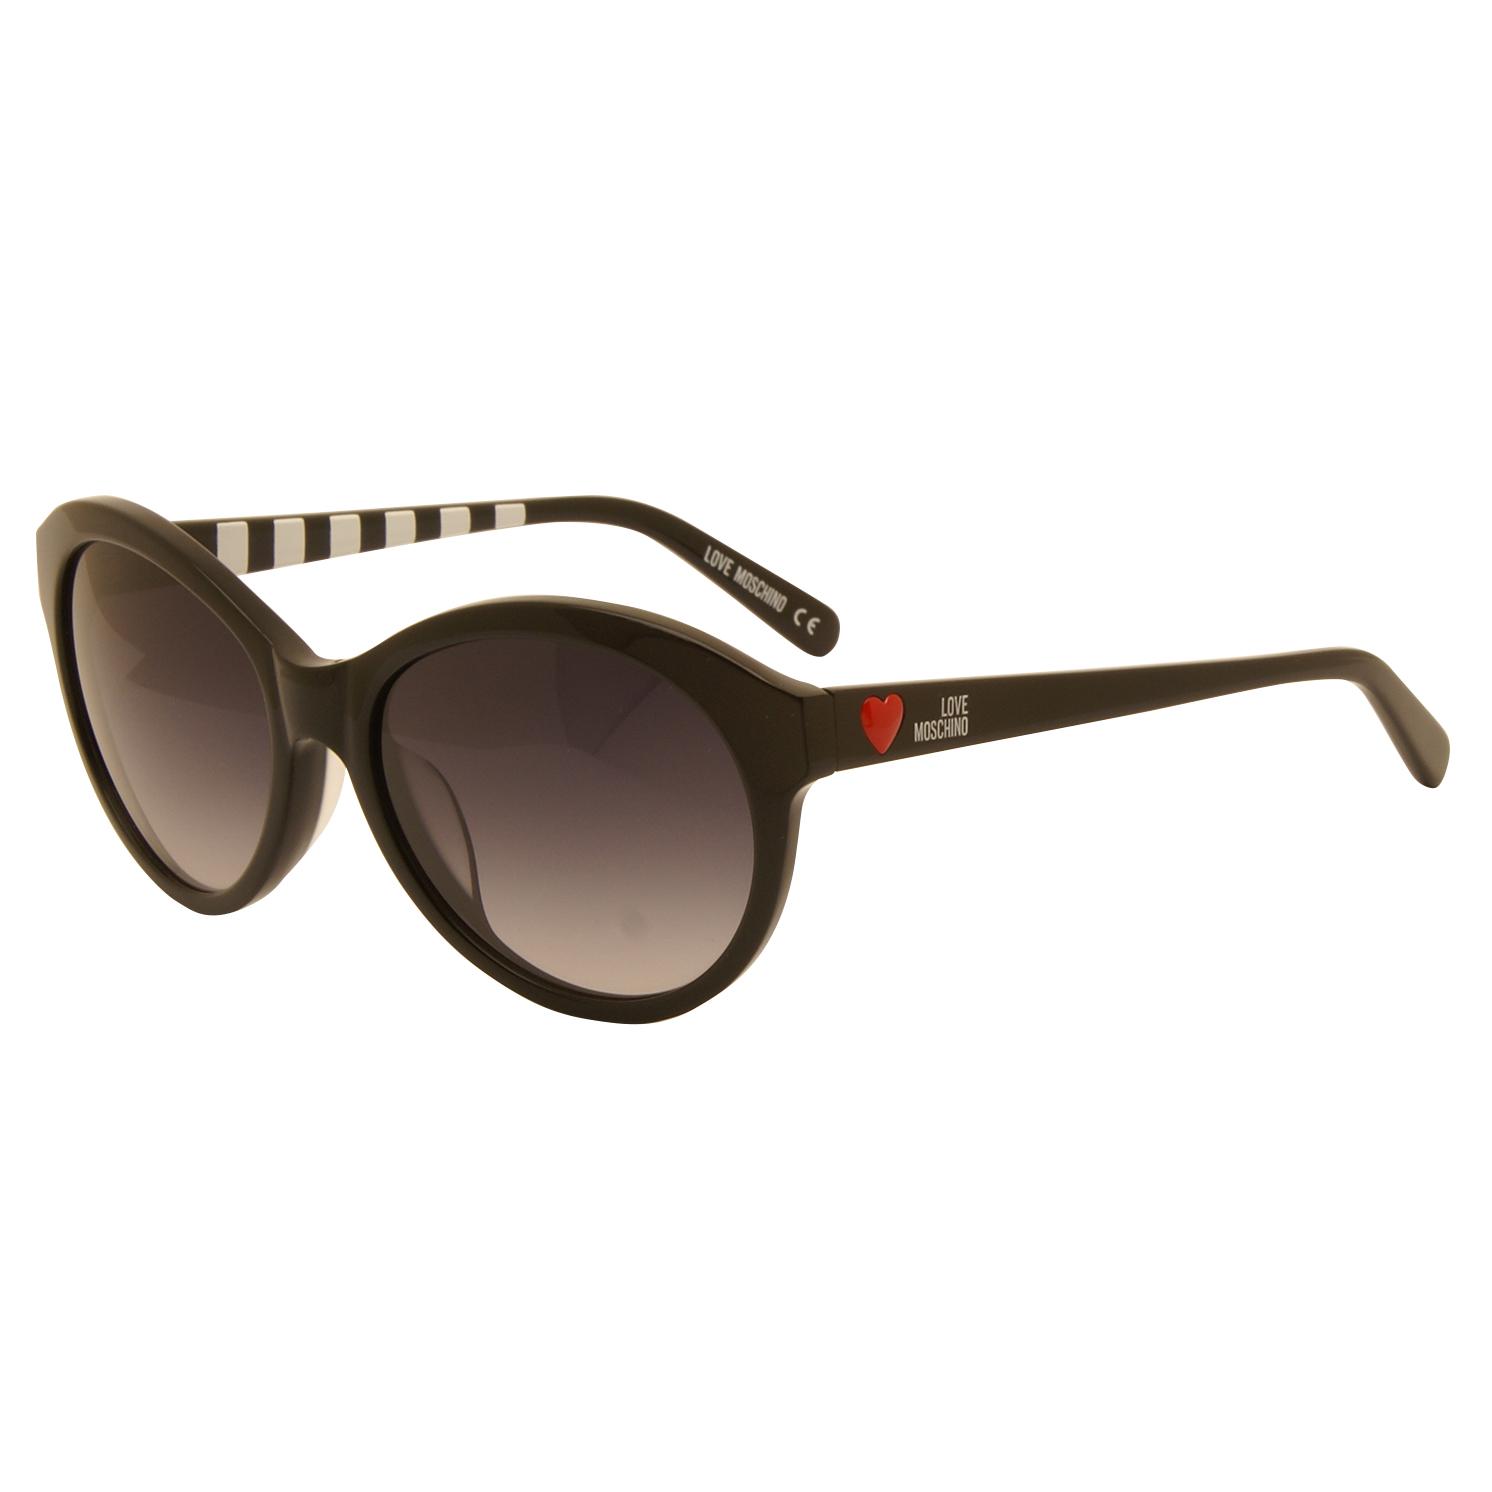 13e8bd50a11 Love Moschino - Shiny Black Classic Style Sunglasses with Case - YaYa21